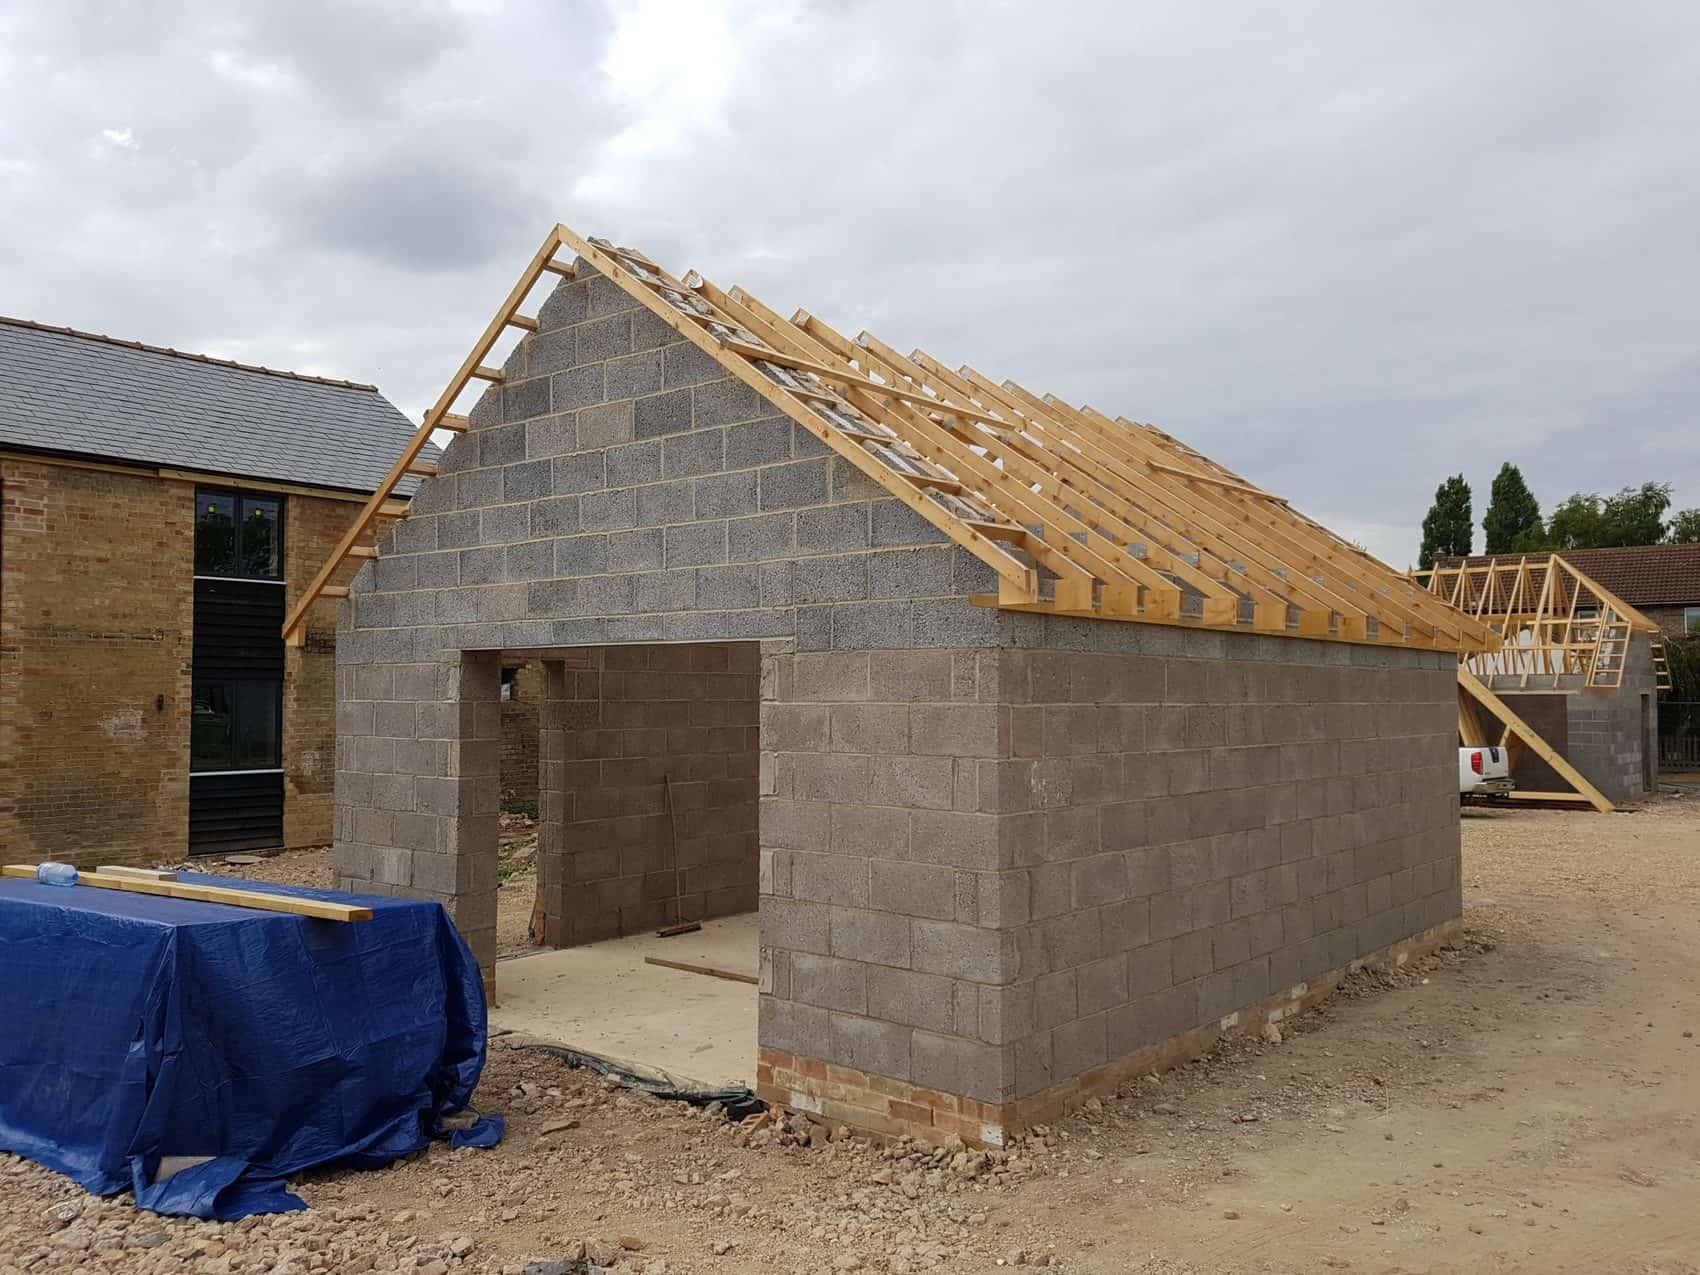 upward-barn conversions-traditional build-plot2-4-min